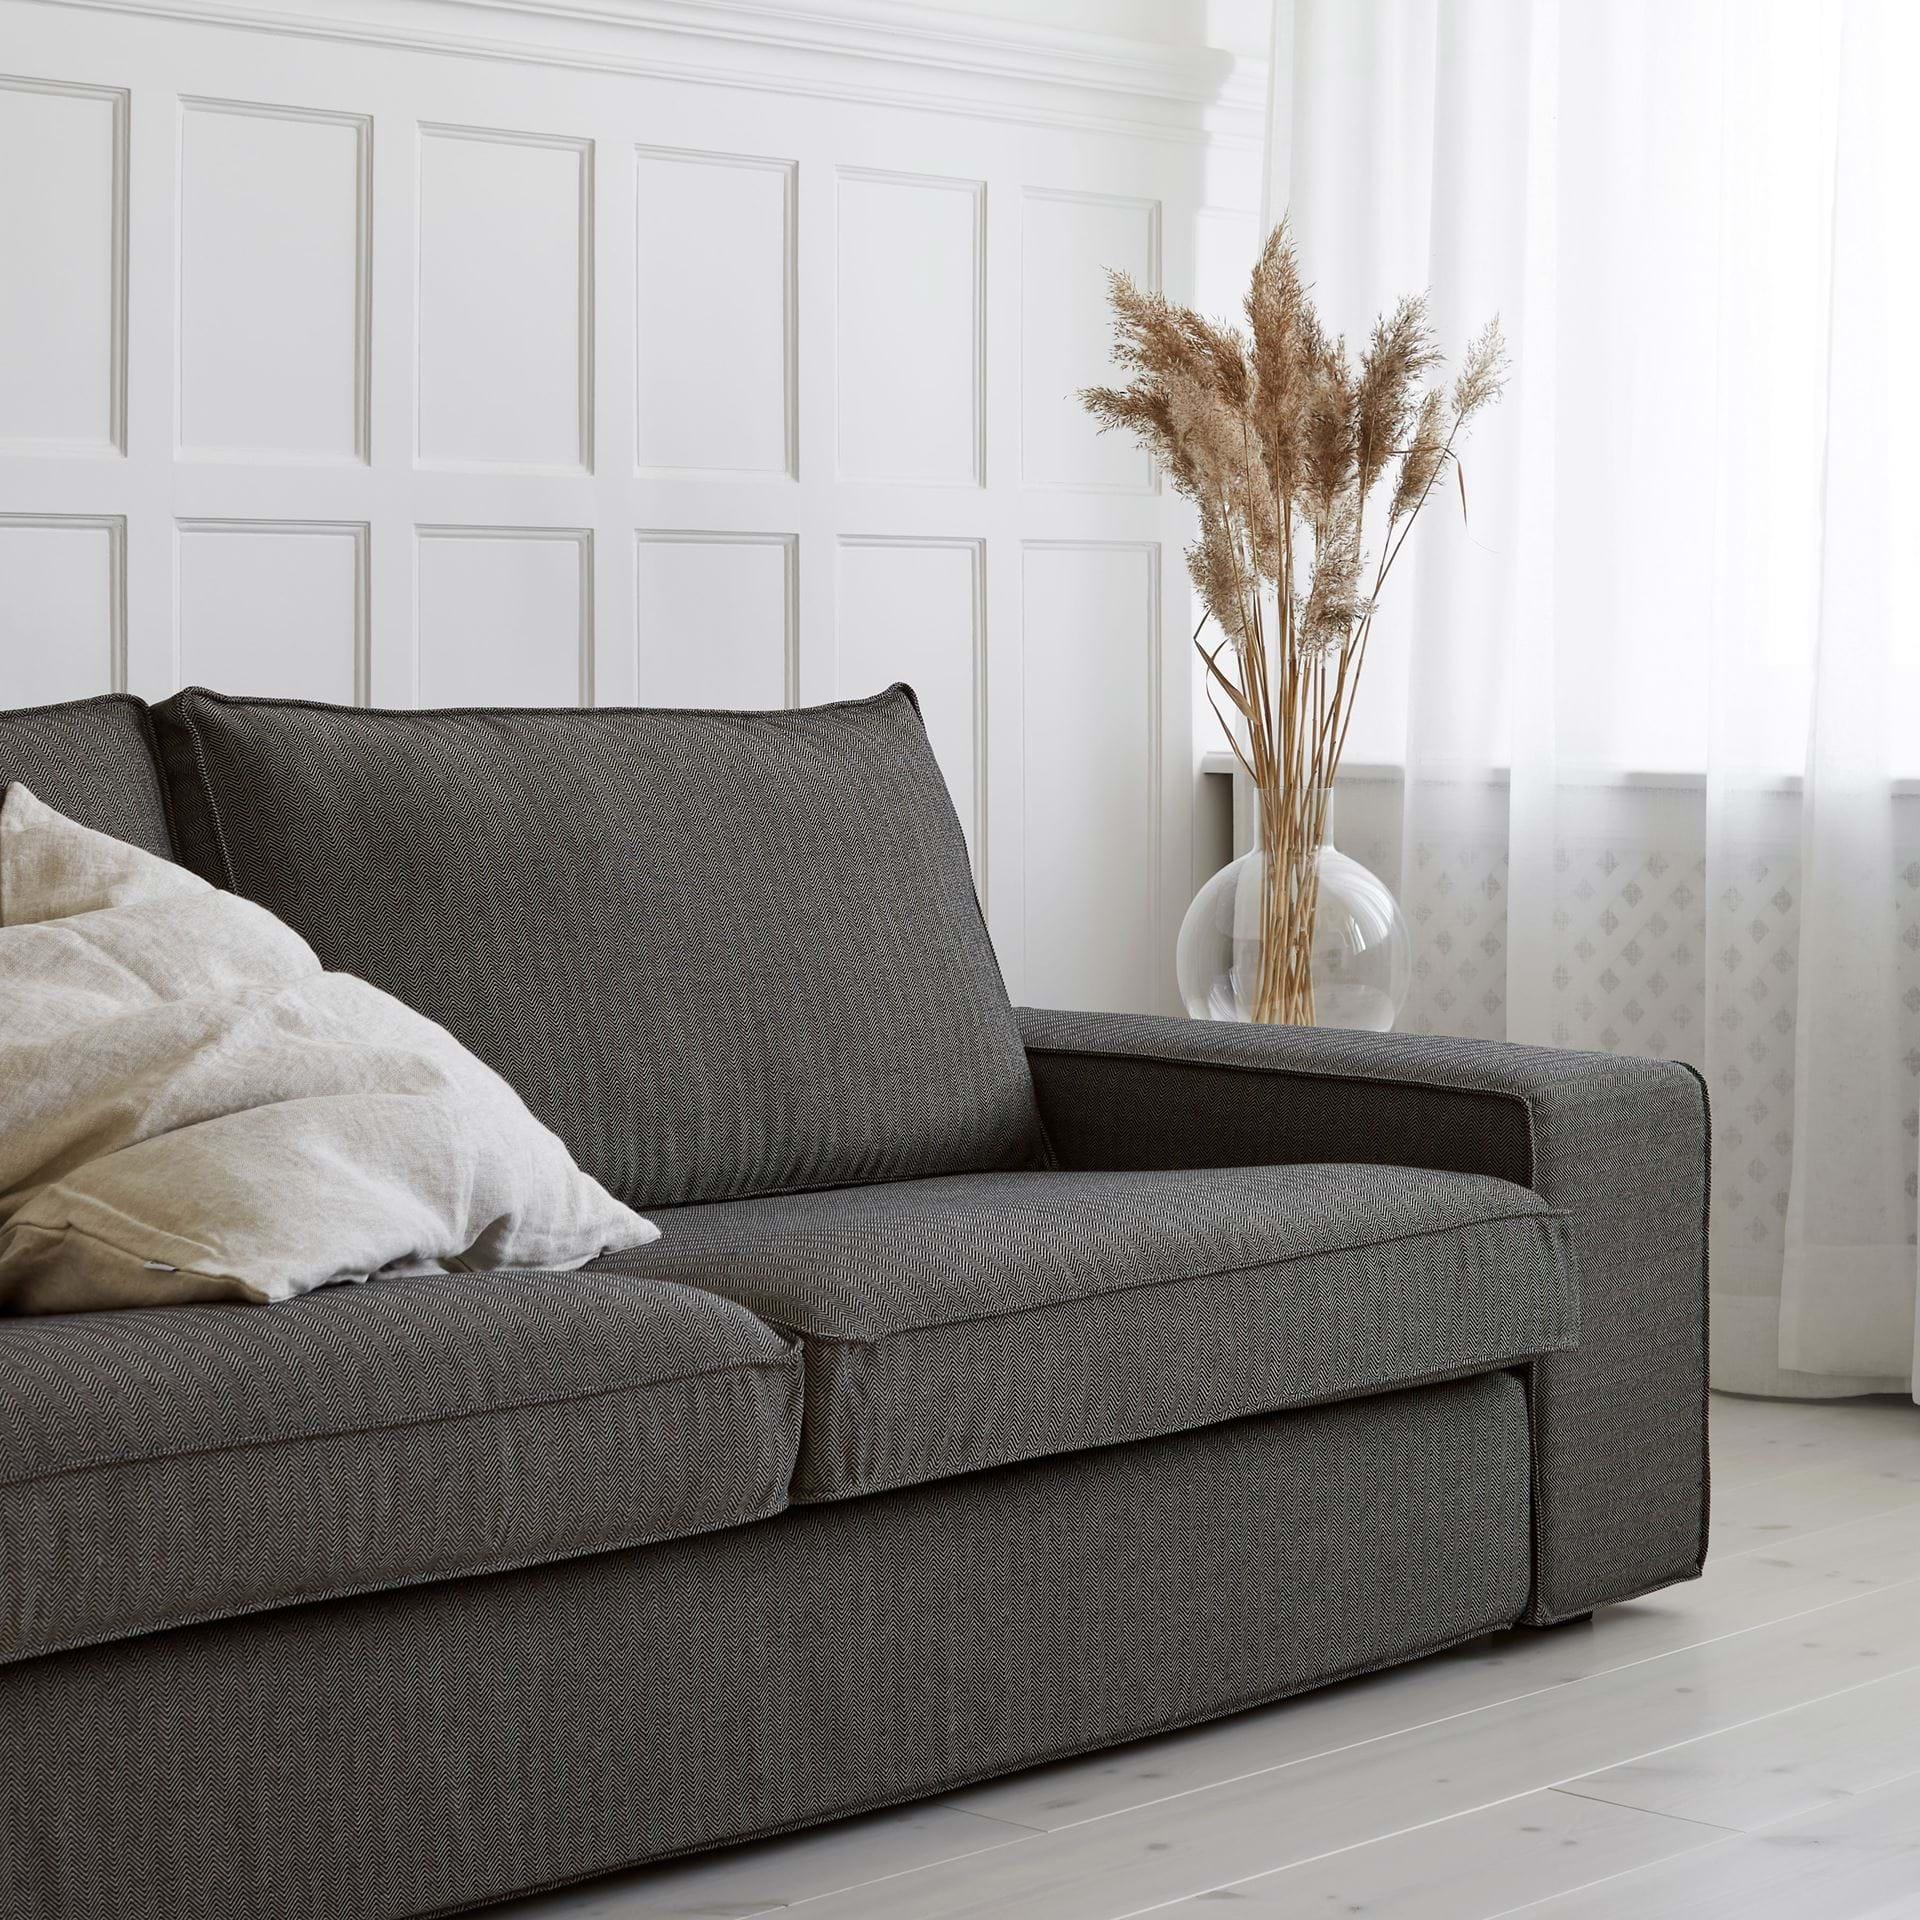 Ikea Federe Cuscini Divano ikea kivik, fodera per divano a 3 posti - bemz | bemz